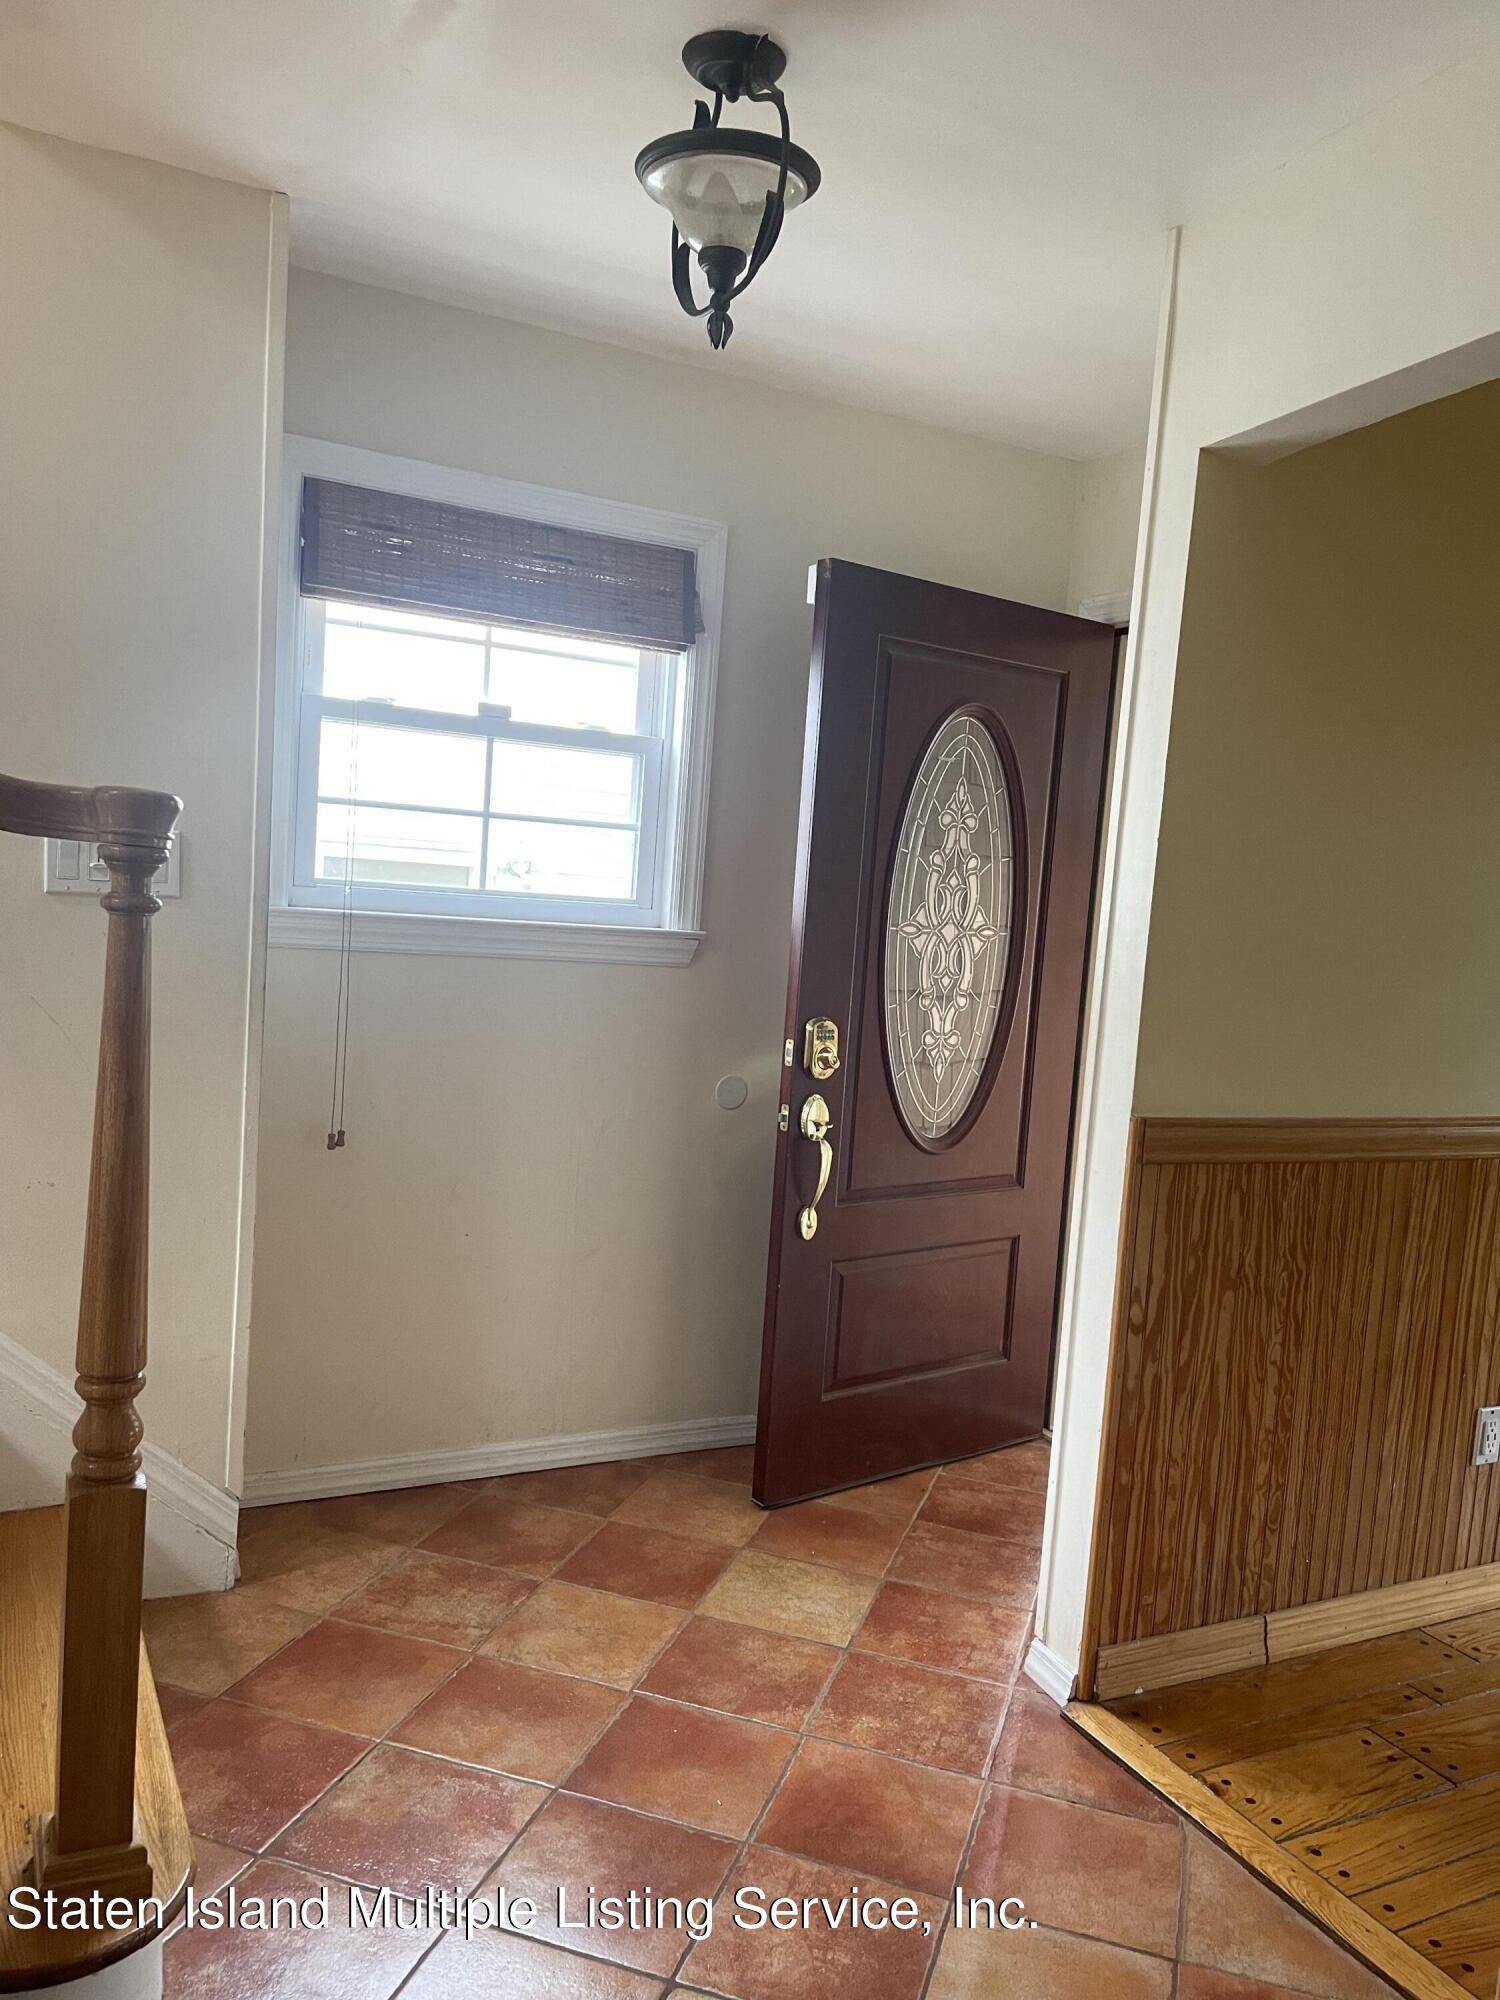 Single Family - Detached 484 Mountainview Avenue  Staten Island, NY 10314, MLS-1147175-48